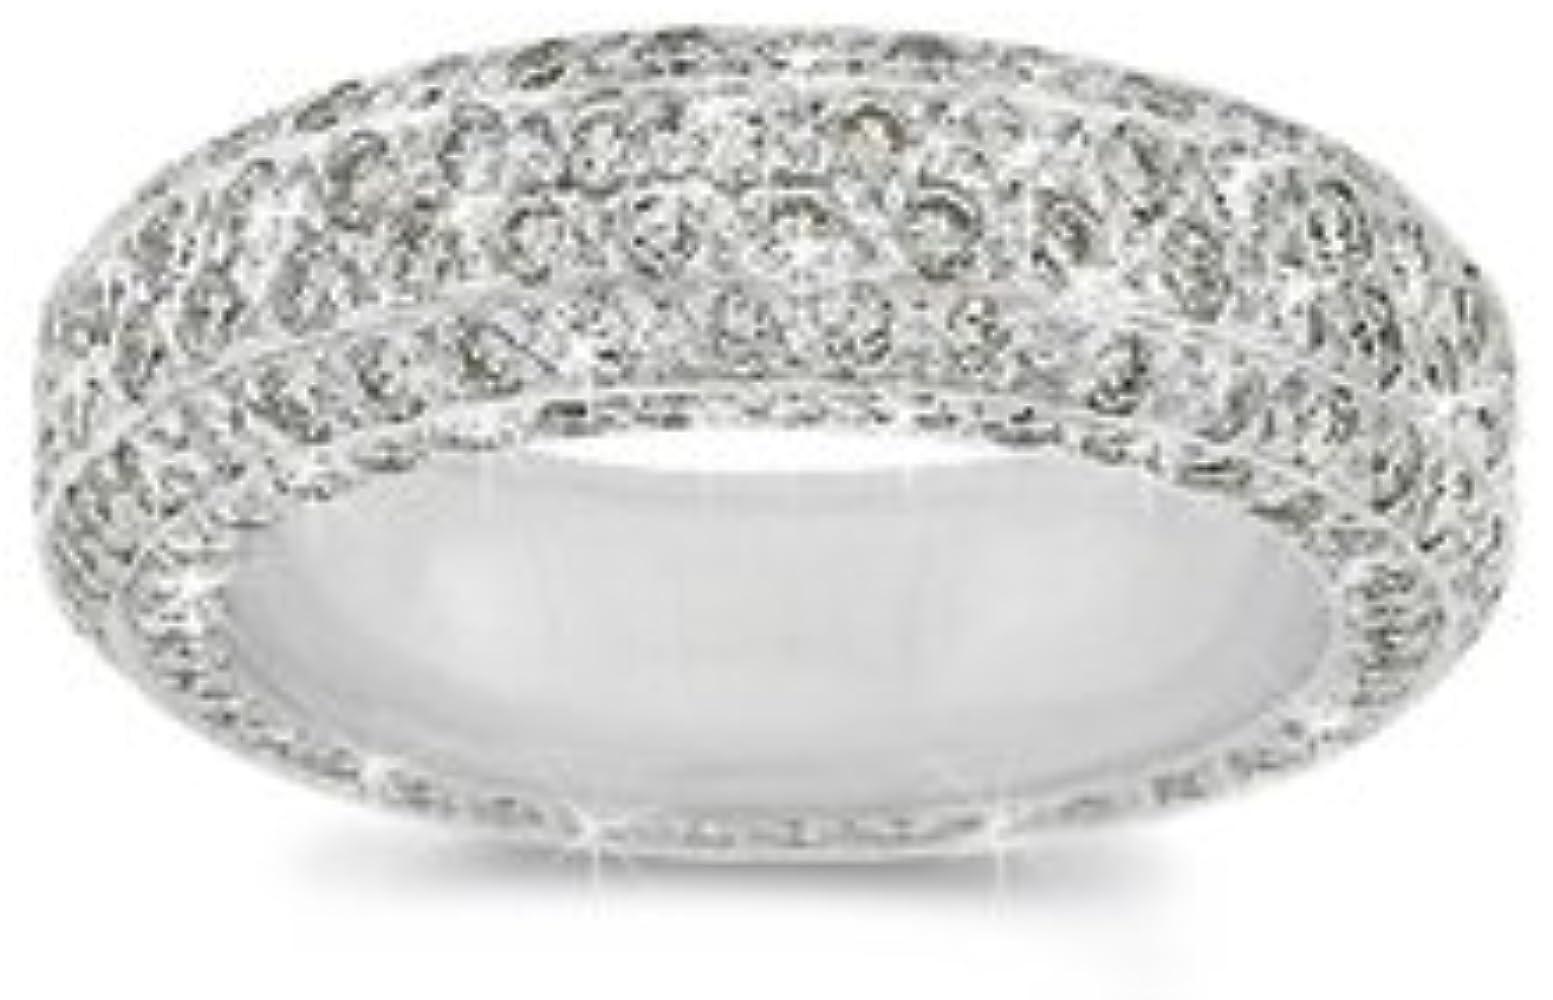 CleverEve CleverEve's Diamond Eternity Ladies Ring in 18k